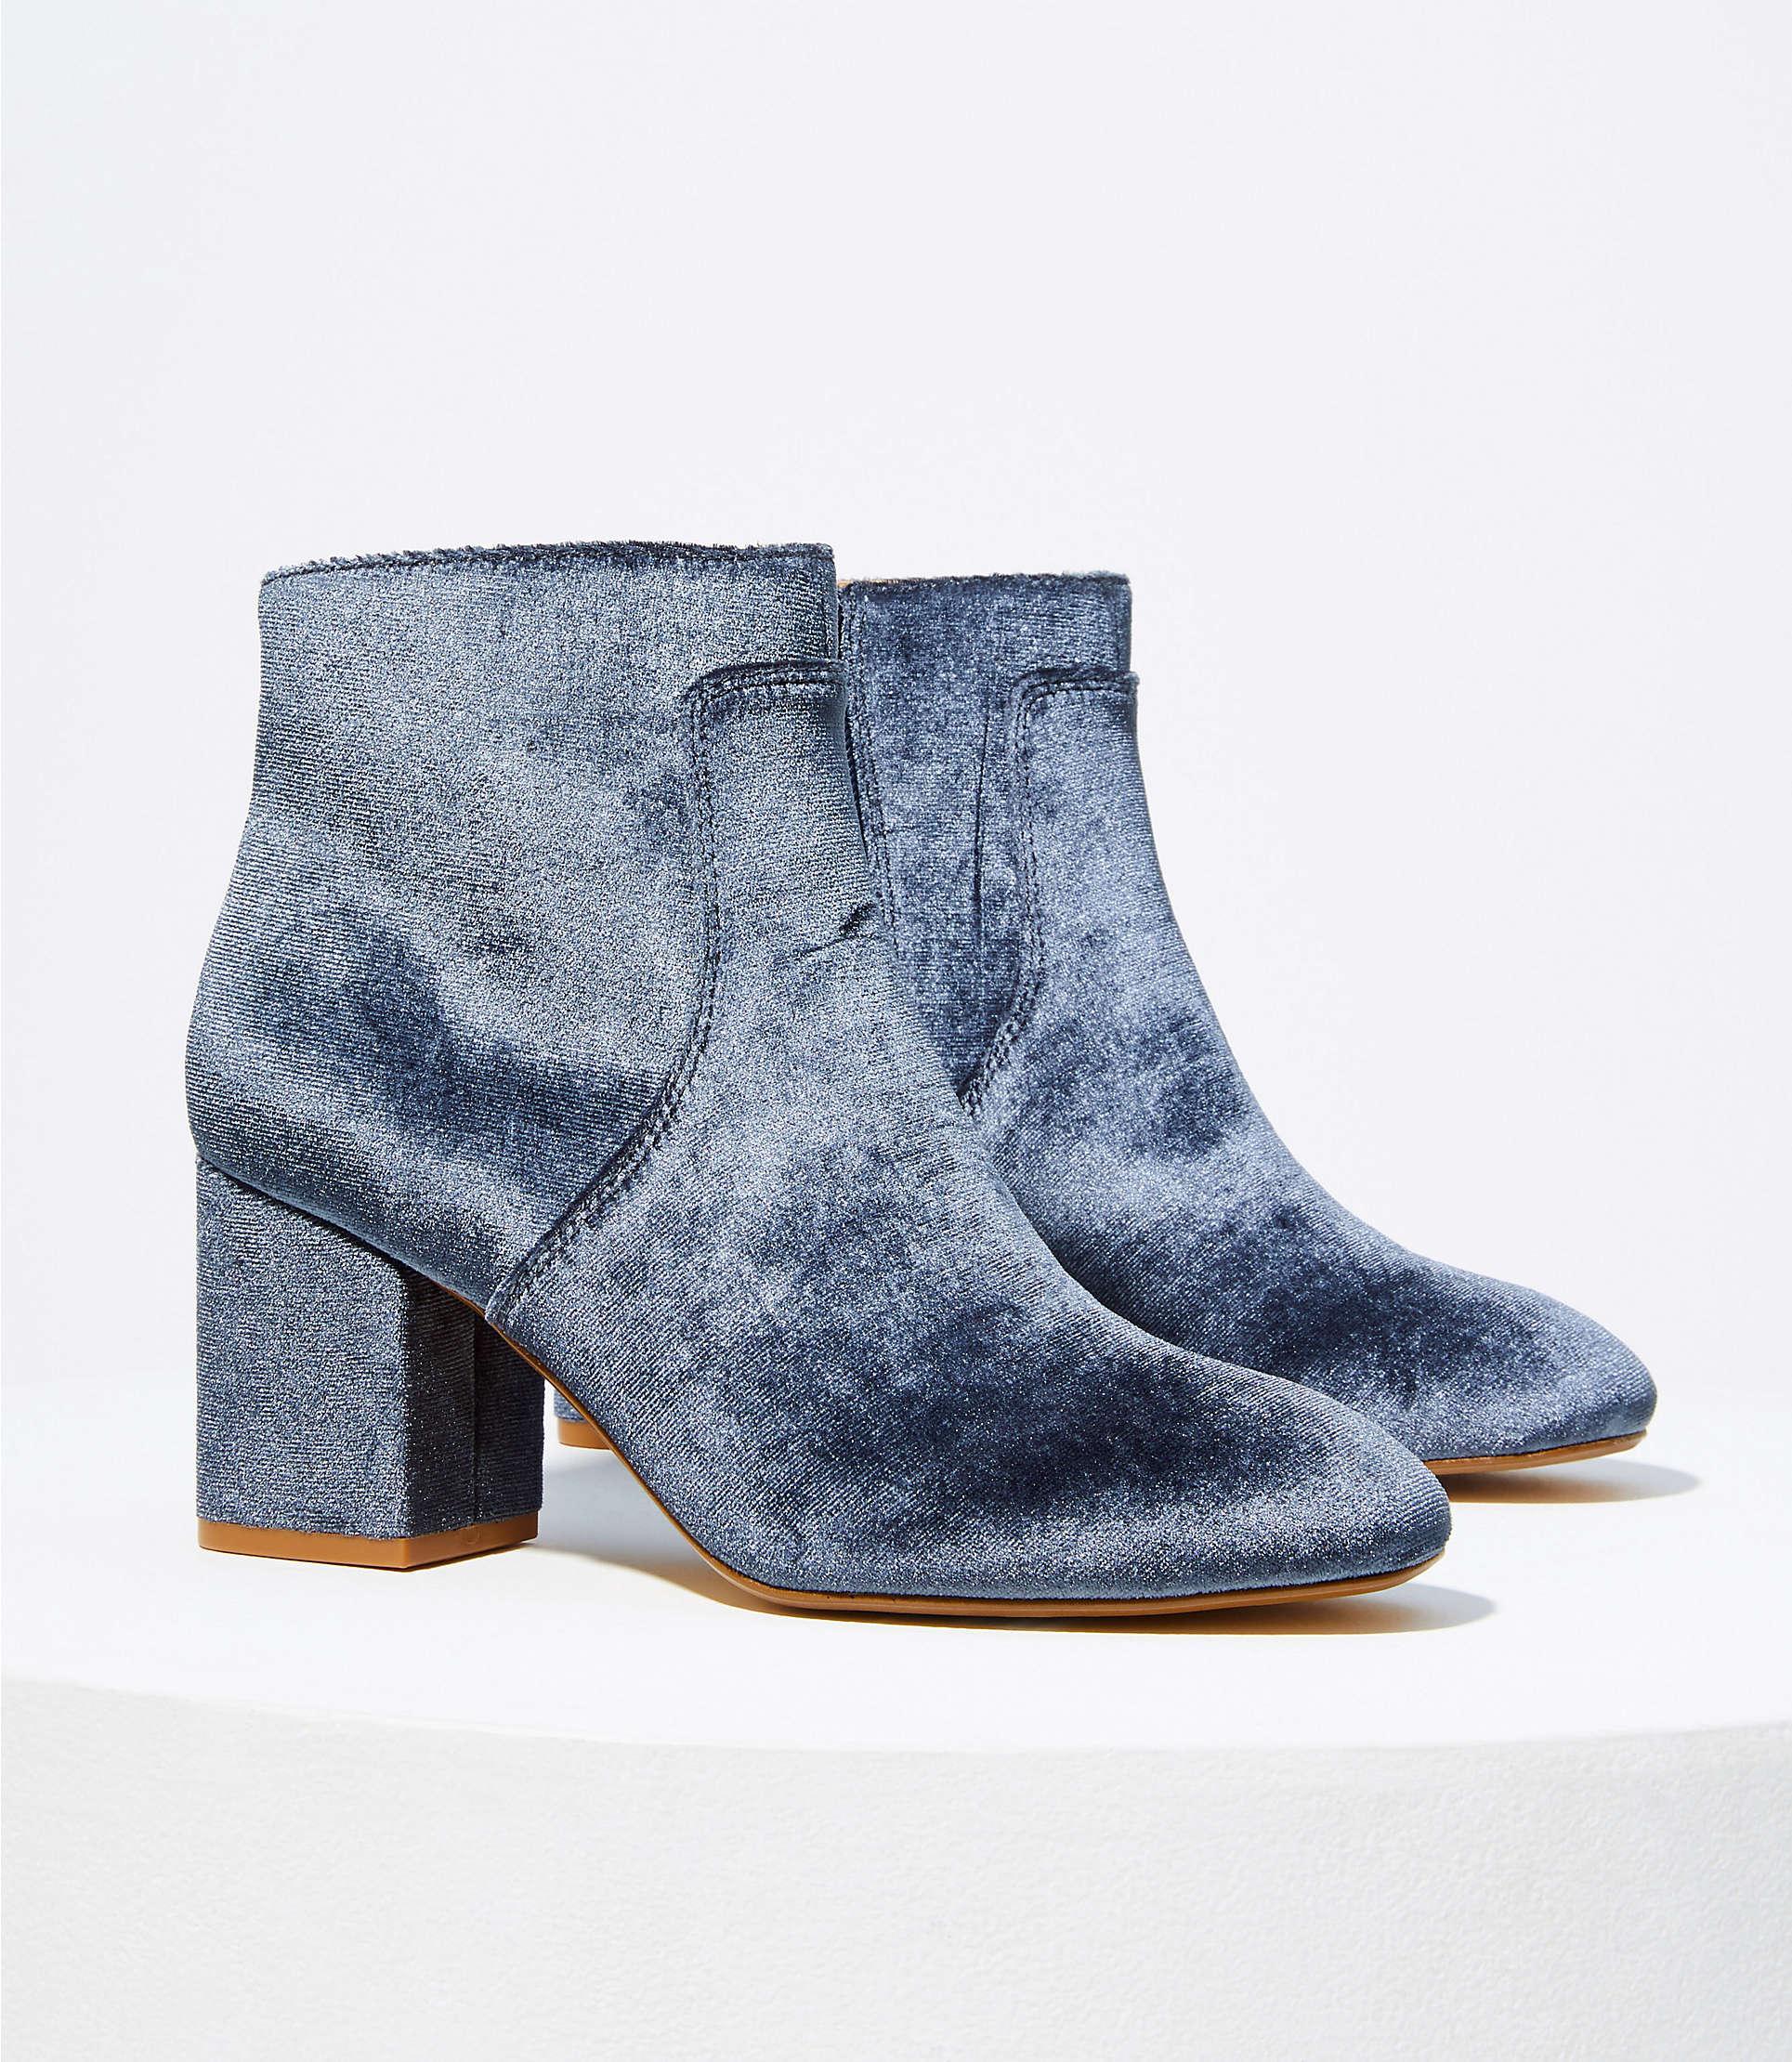 Velvet Block Heel Ankle Boots